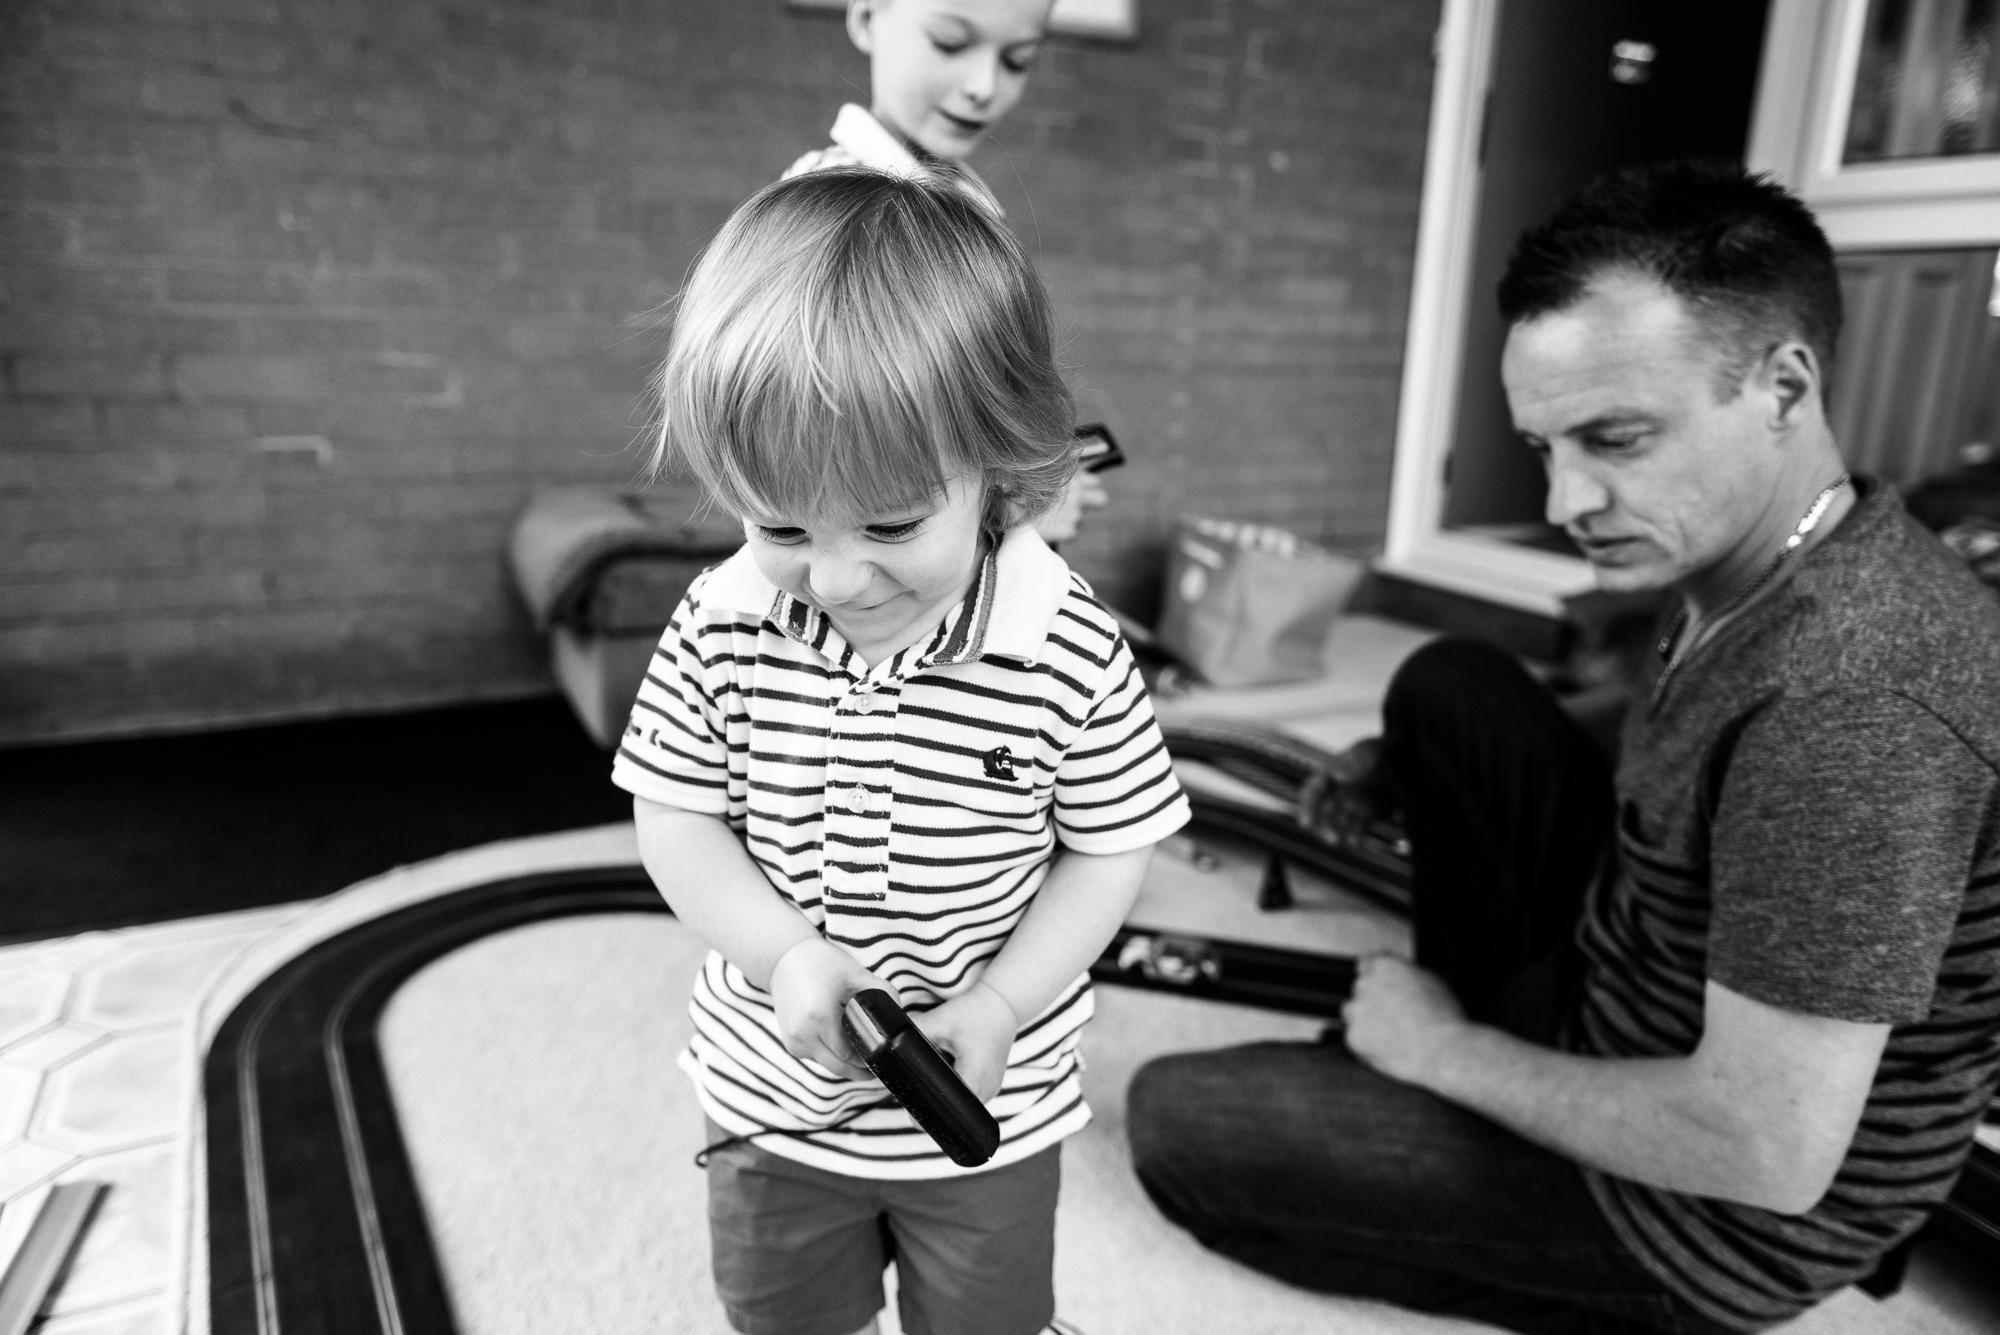 Family Lifestyle Documentary Photography Newborn Photos Candid Family Photographer - Jenny Harper Photography-22.jpg